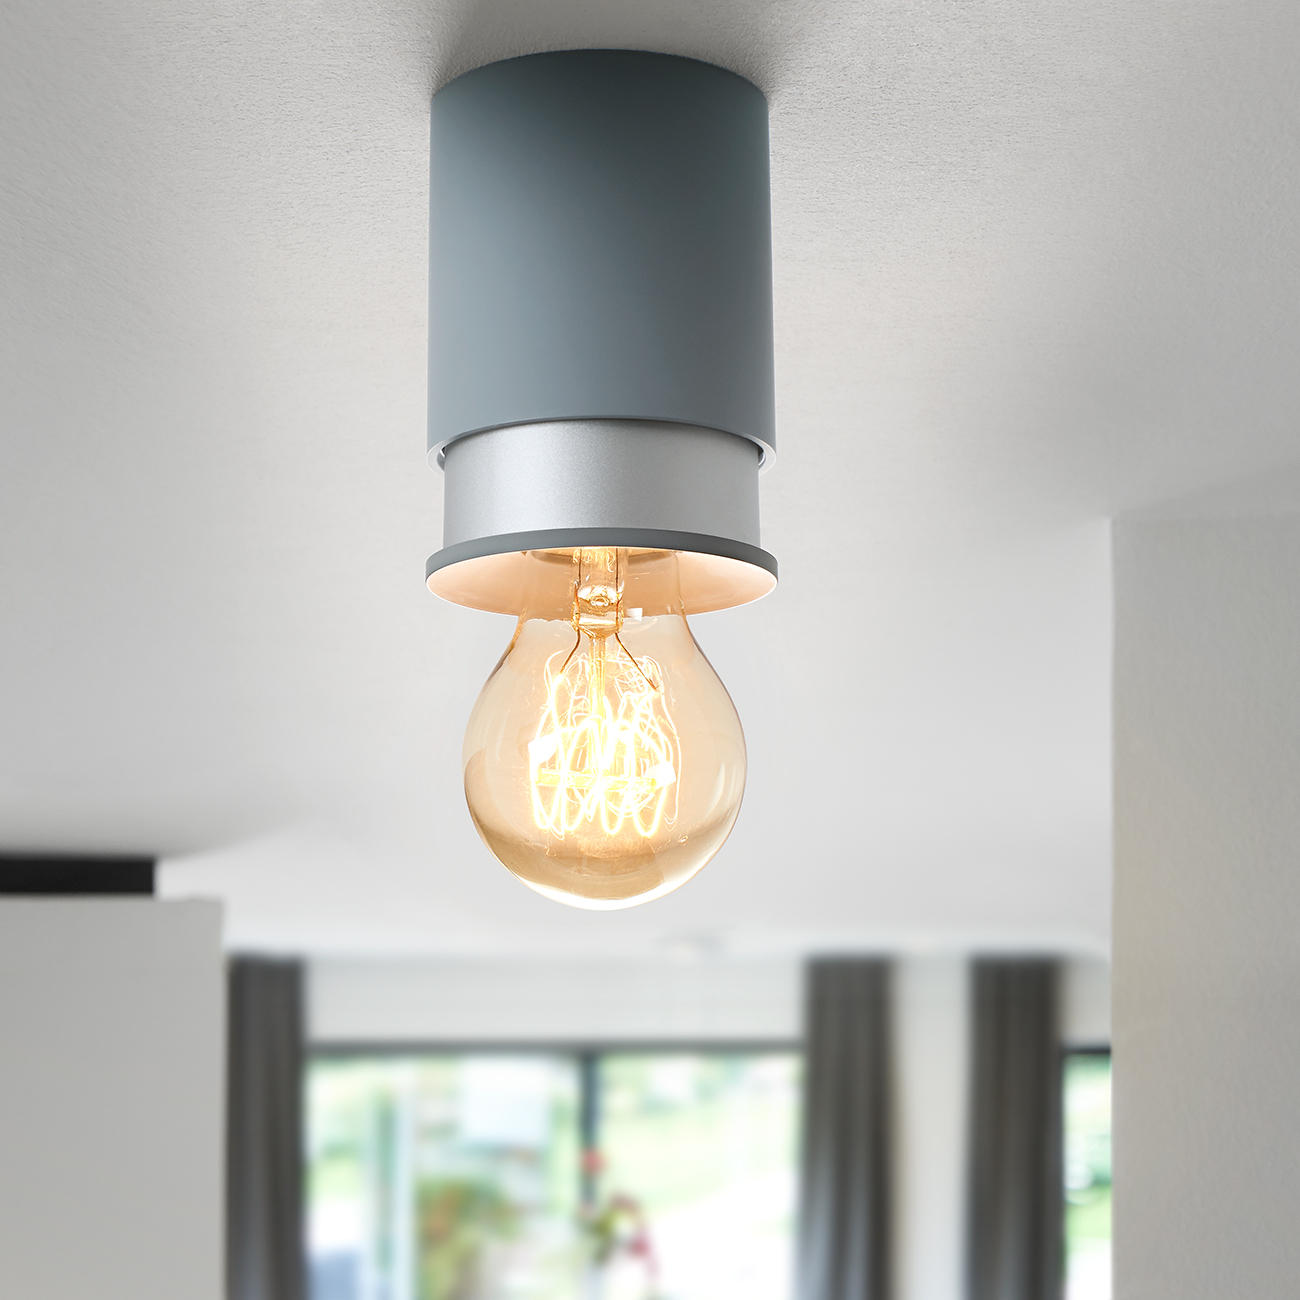 twister lighting deckenleuchte classic anthrazit silber. Black Bedroom Furniture Sets. Home Design Ideas